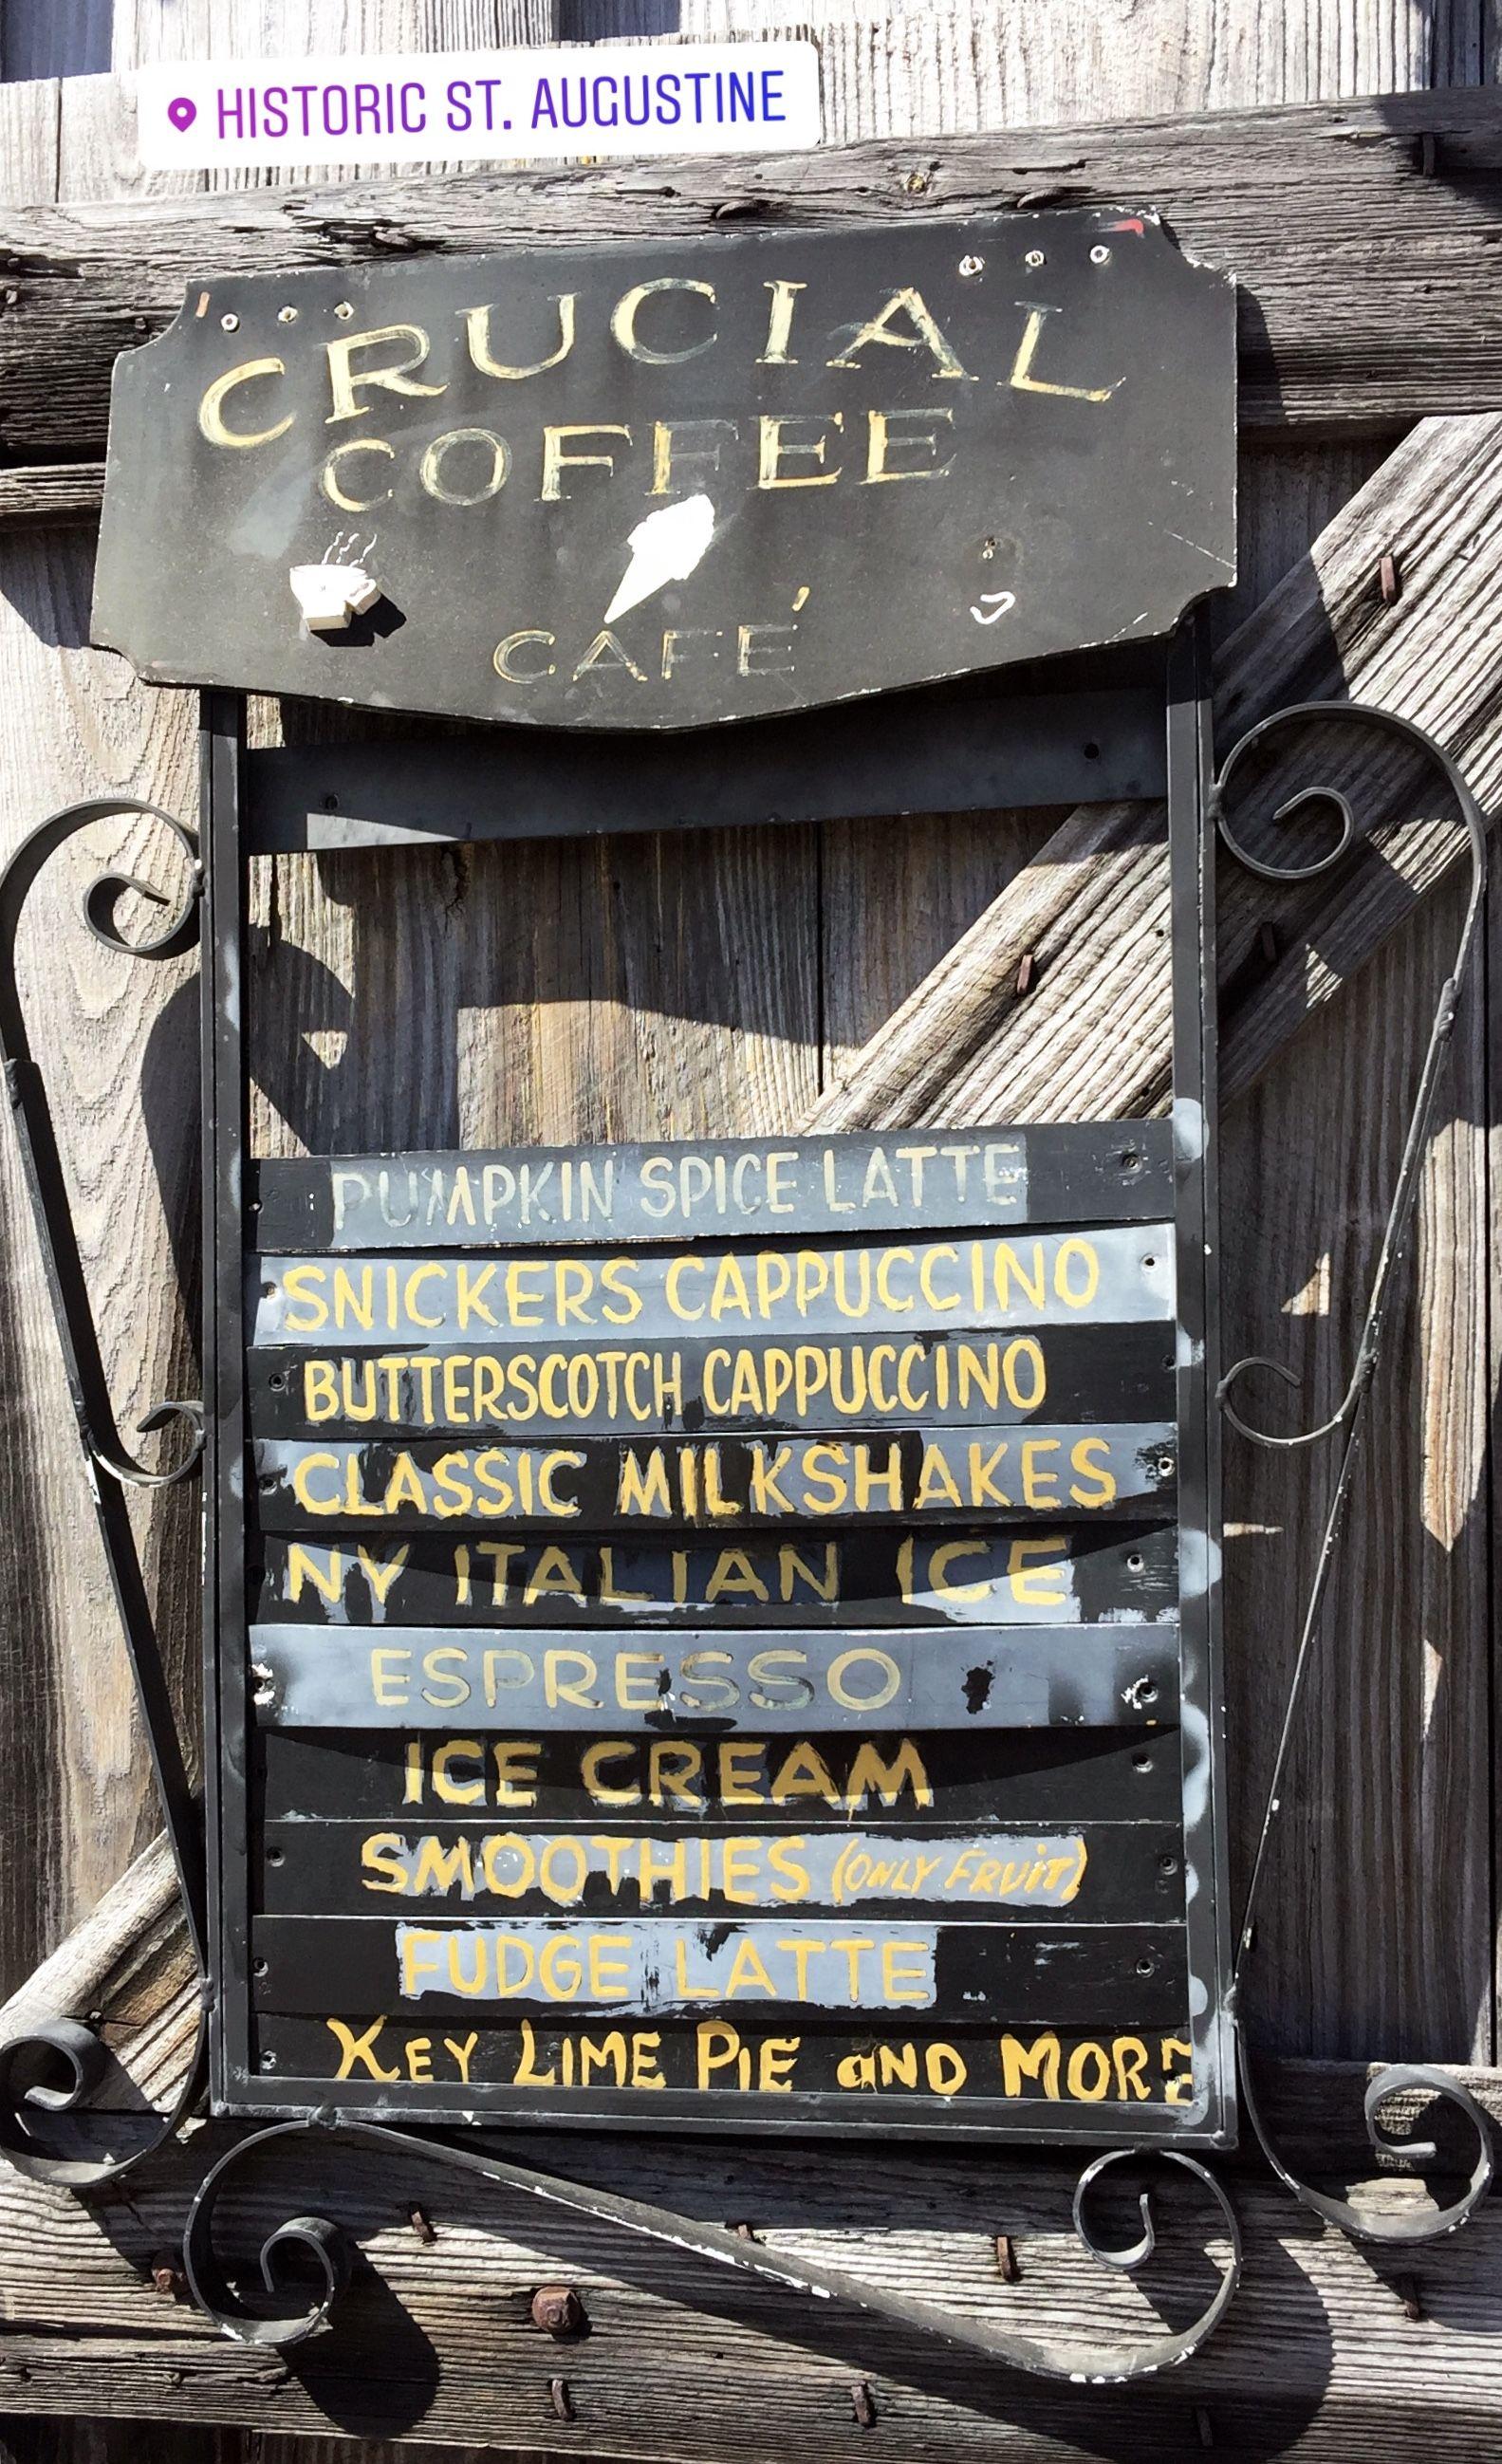 Crucial Coffee Cafe in St Augustine FL Milkway Mocha Latte